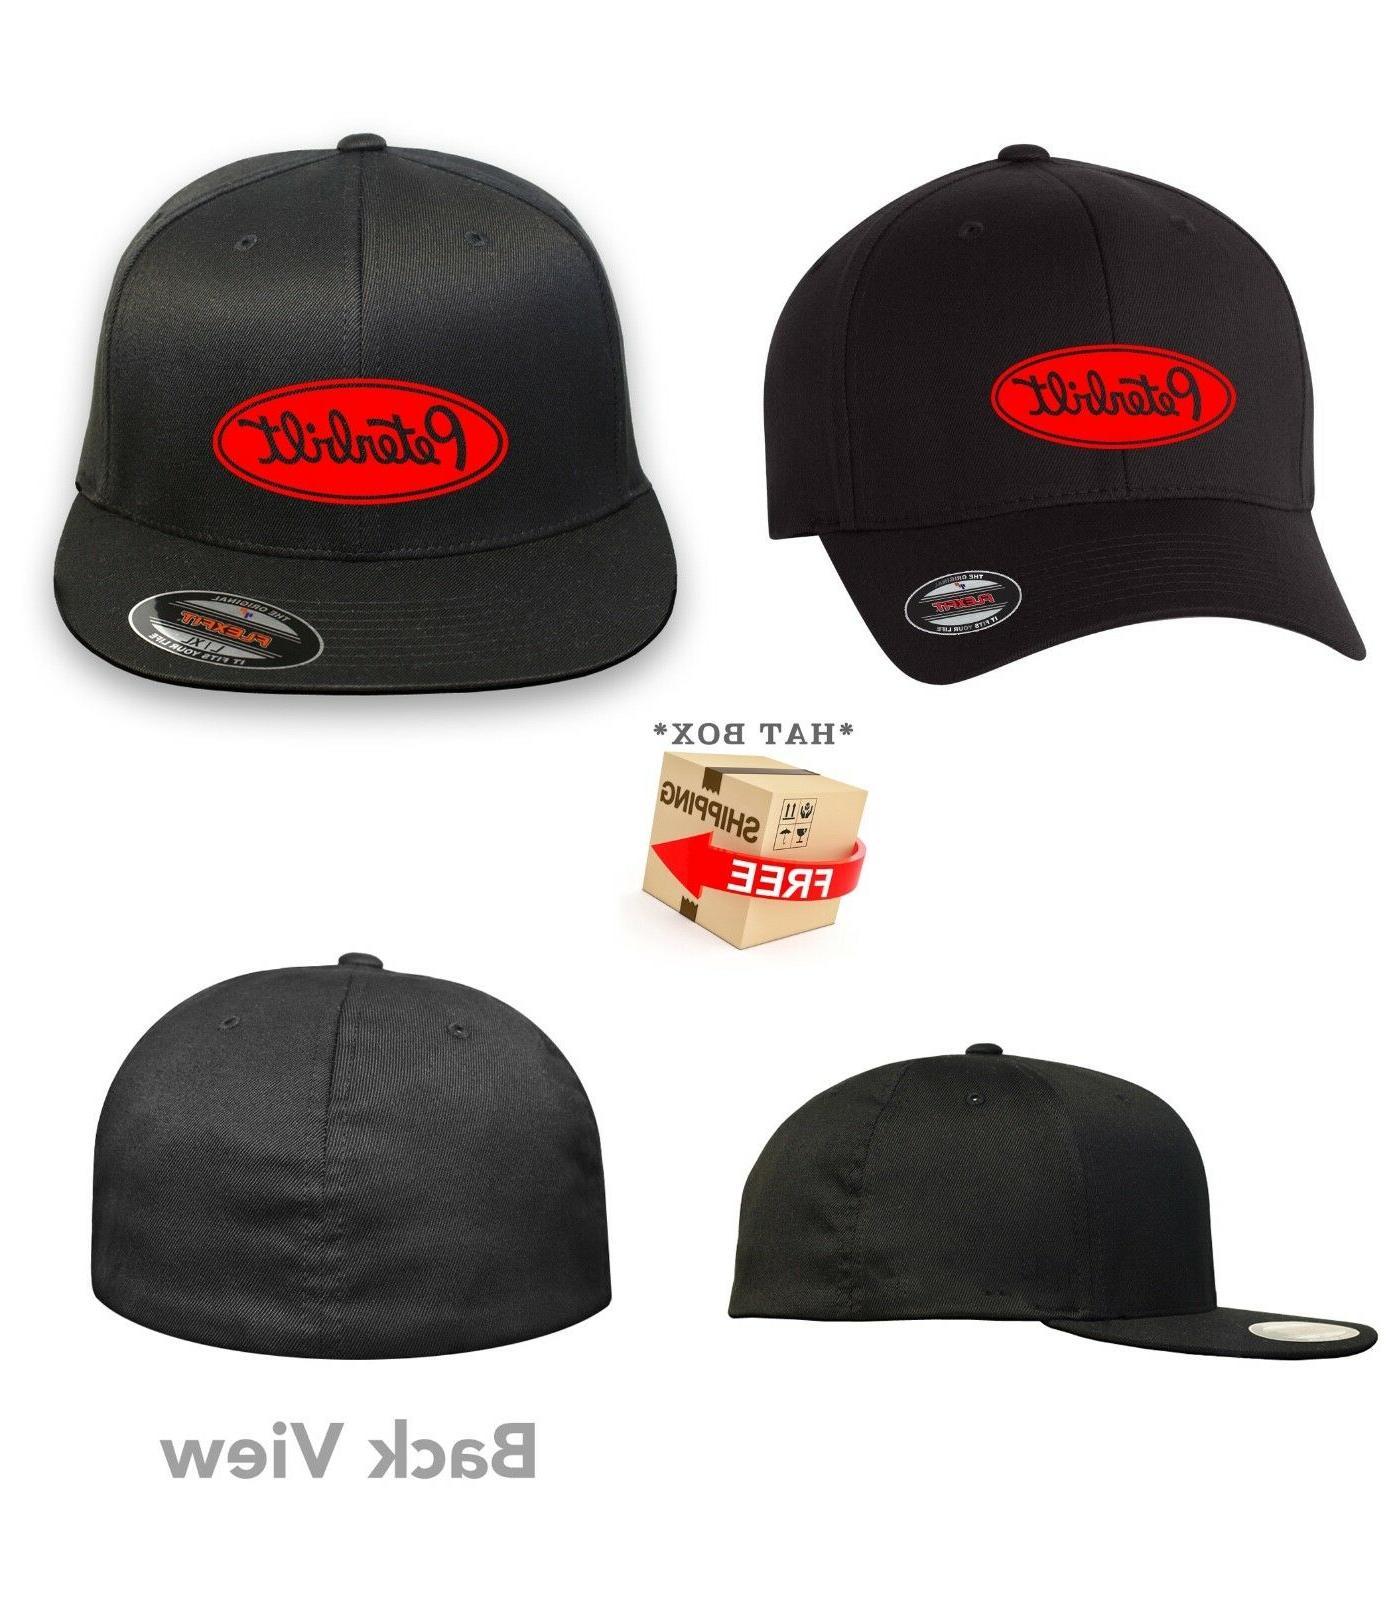 PETERBILT TRUCK Flex Fit HAT CURVED or FLAT CURVED BILL